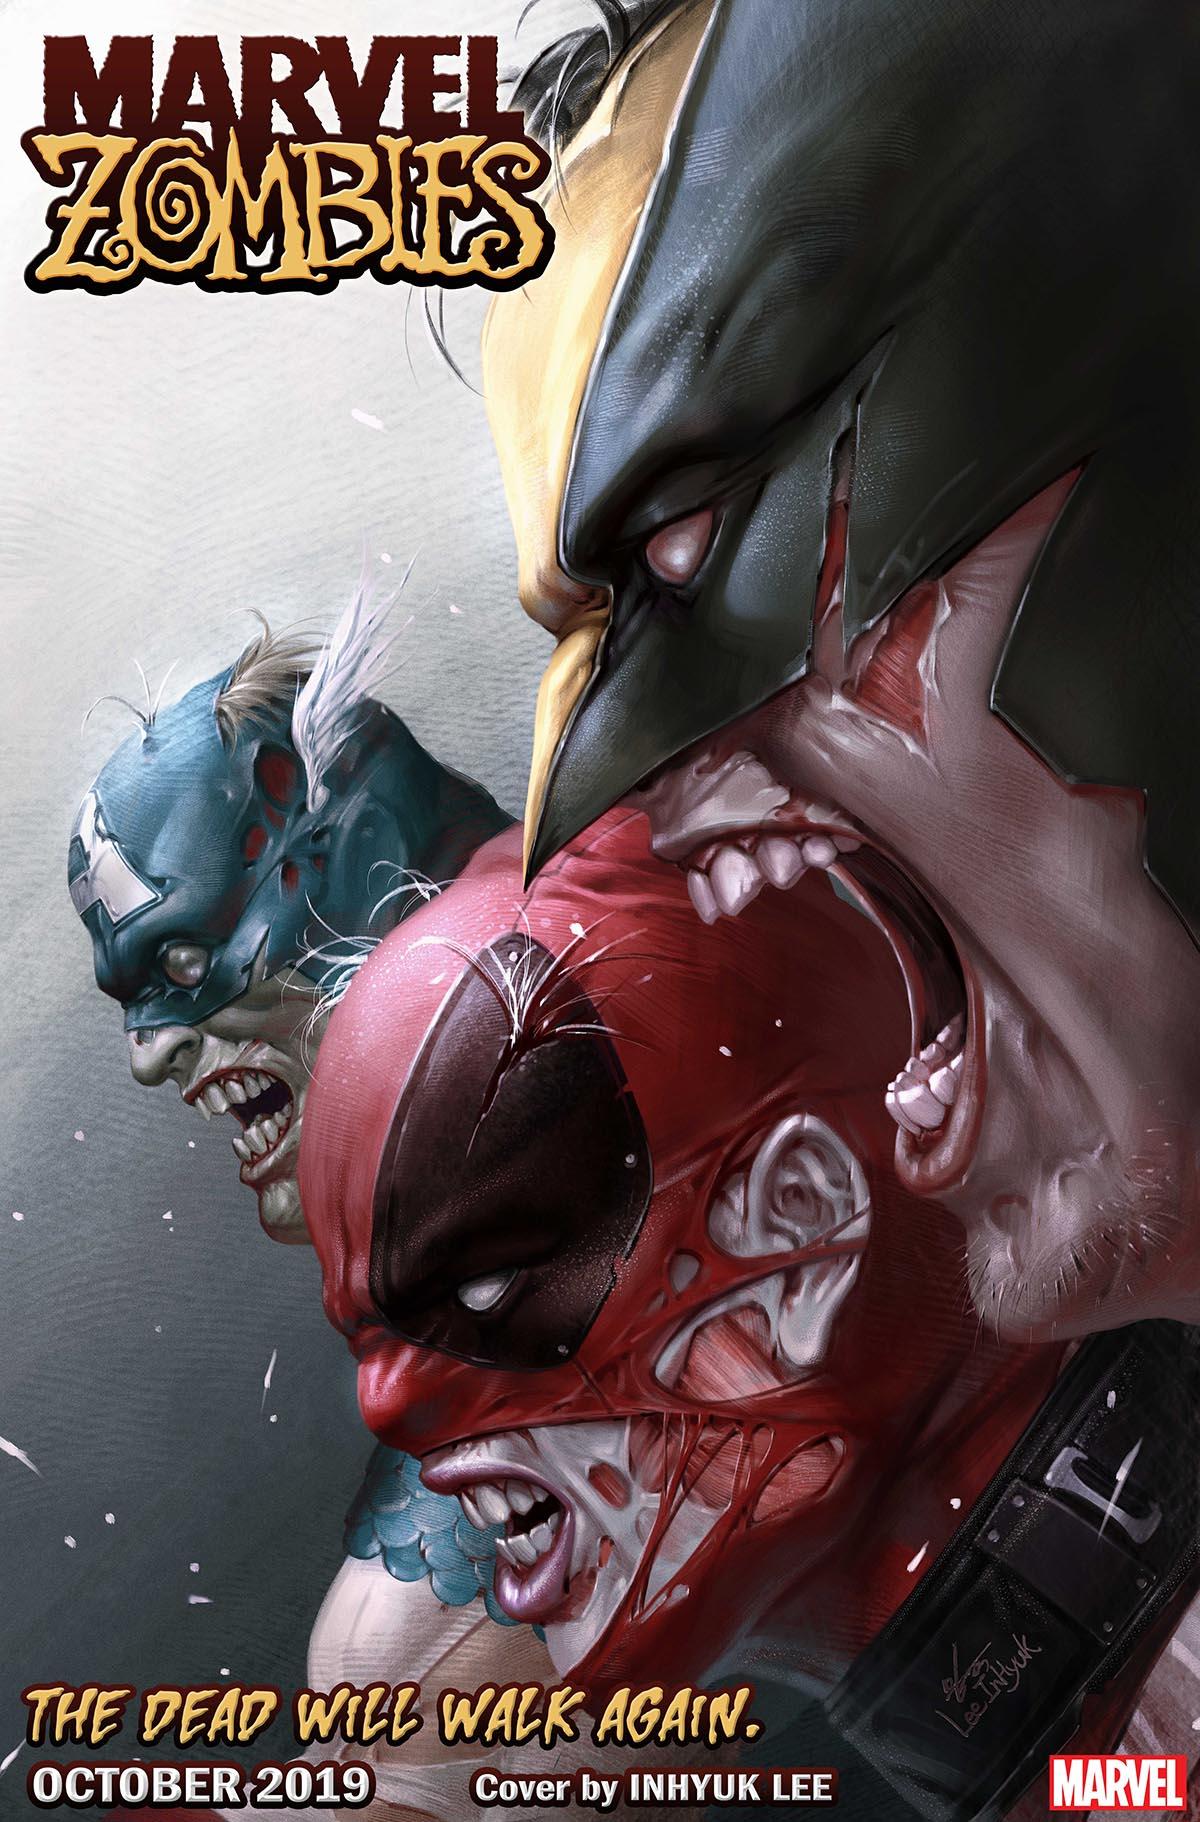 Marvel Minimates Zombies Villains # 3 Age of Ultron Secret Wars Box Set